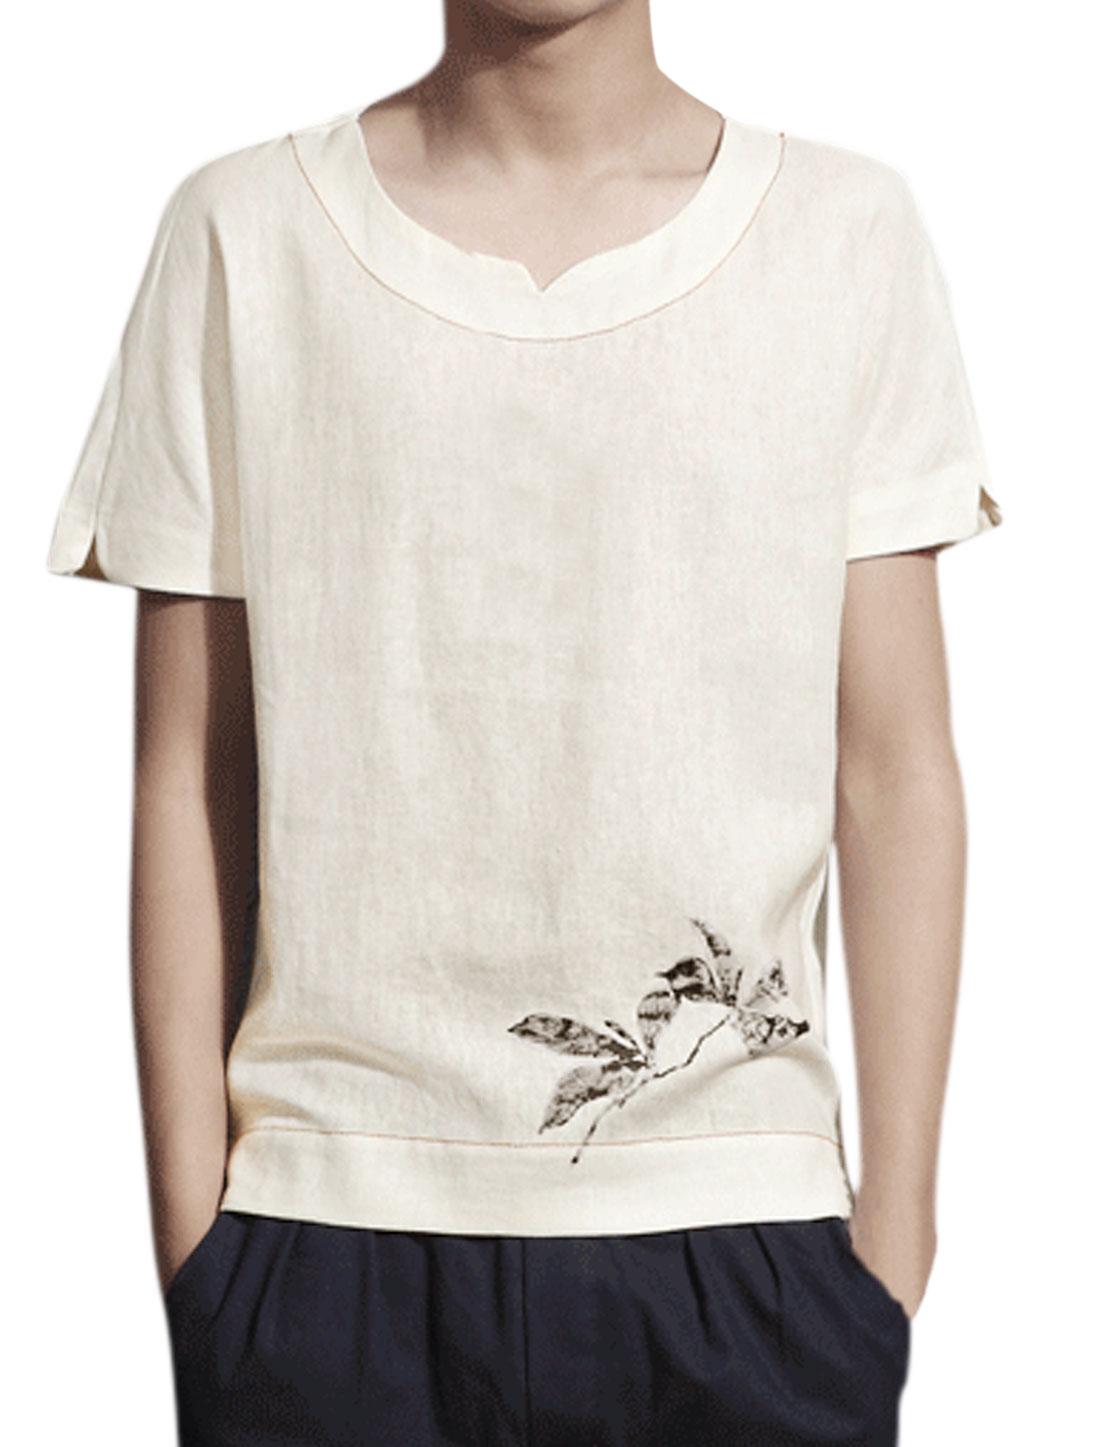 Men Floral Prints Split Neck Short Batwing Sleeve Tee Shirt White M